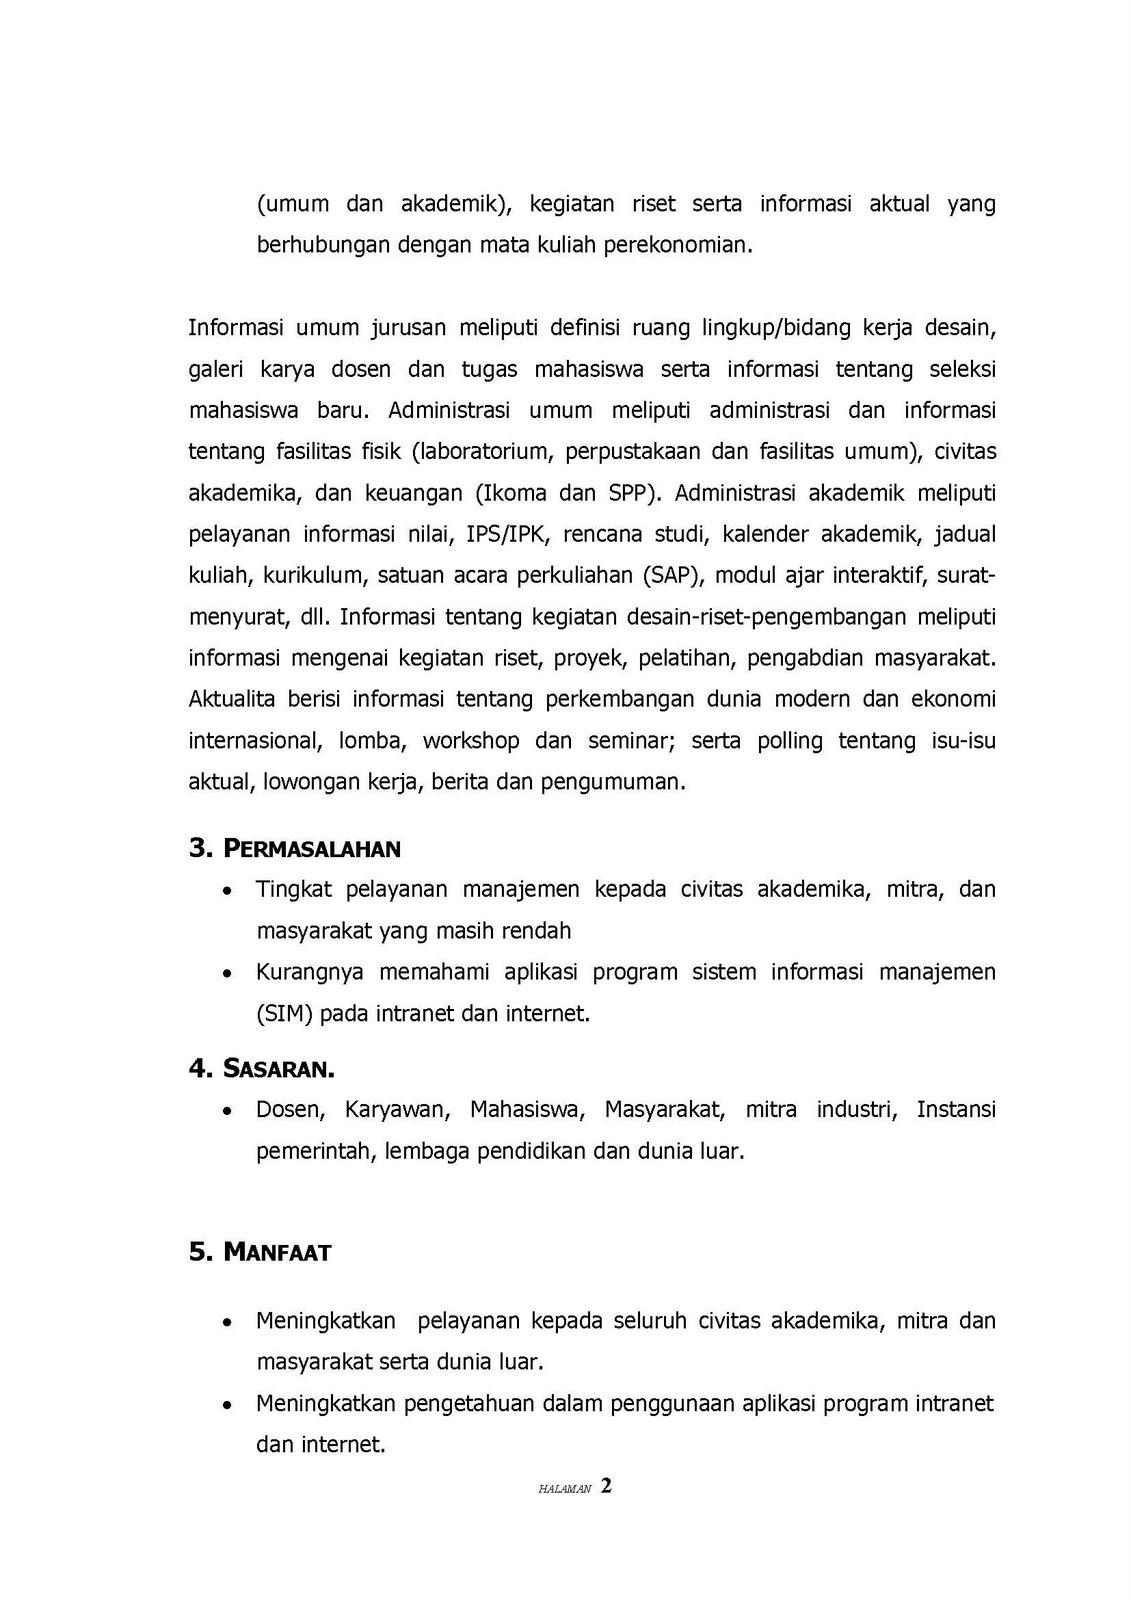 Proposal Business Plan Keripik Singkong